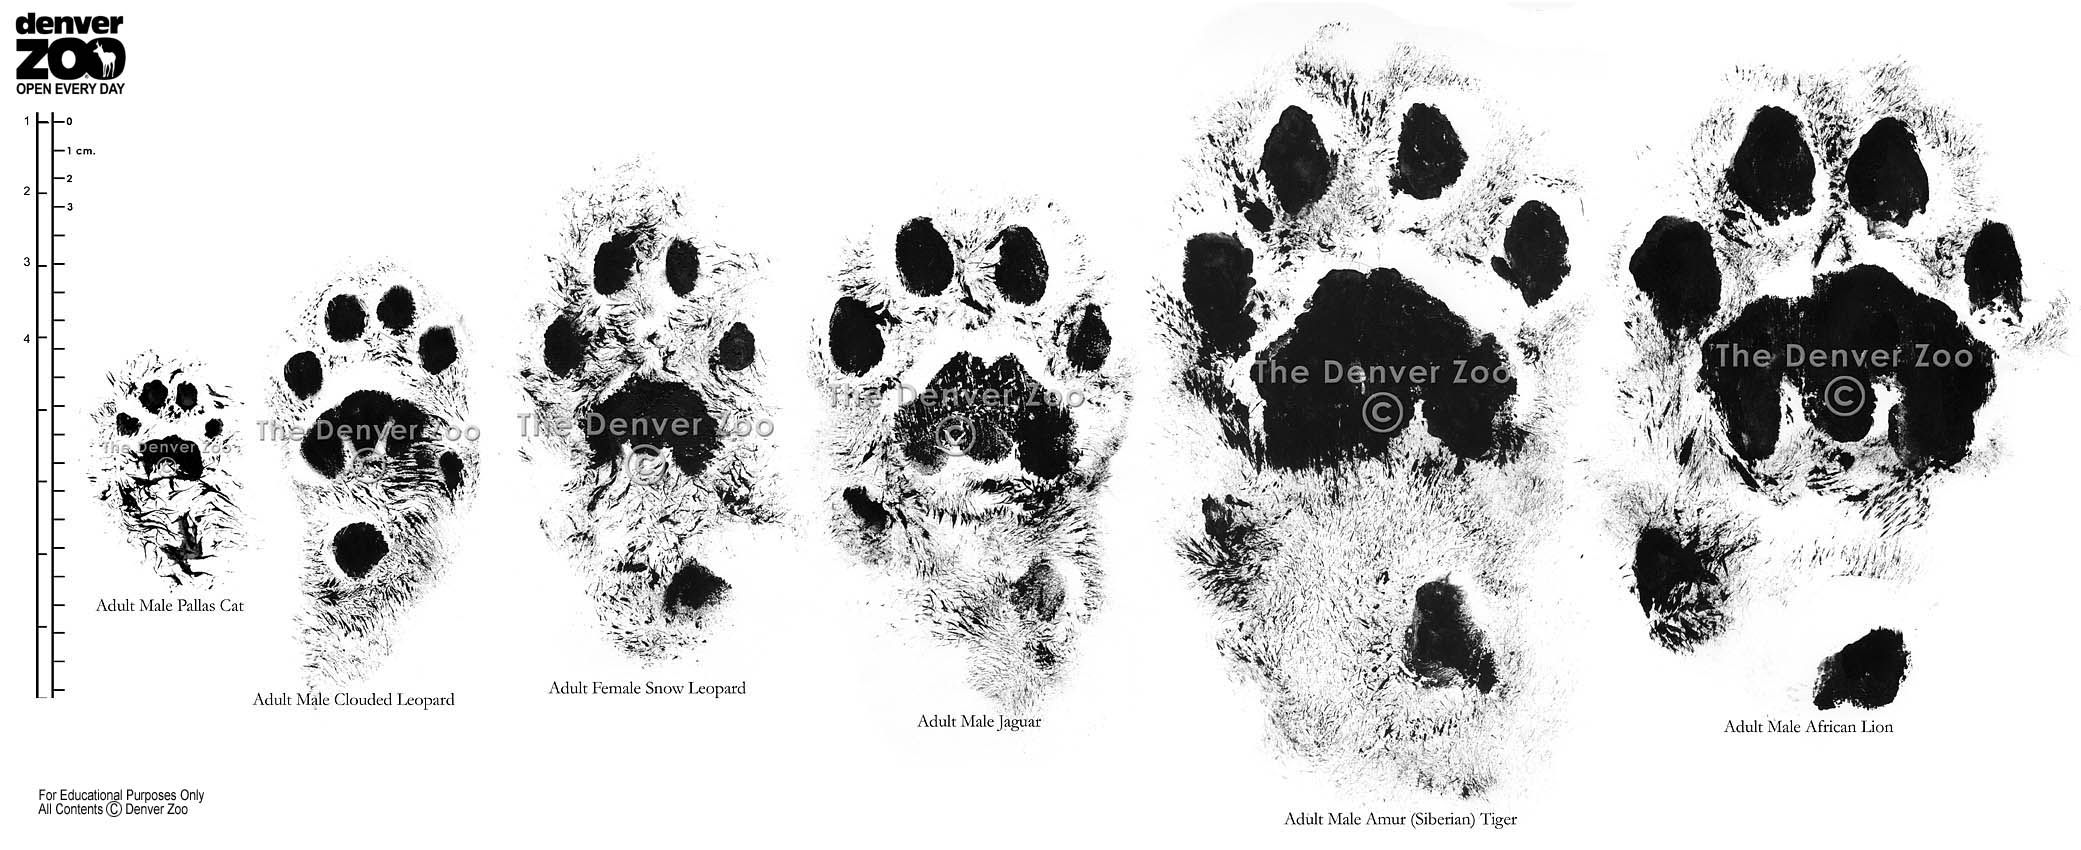 cat_comparison_large.jpg (2081×850) | Feline Anatomy | Pinterest ...